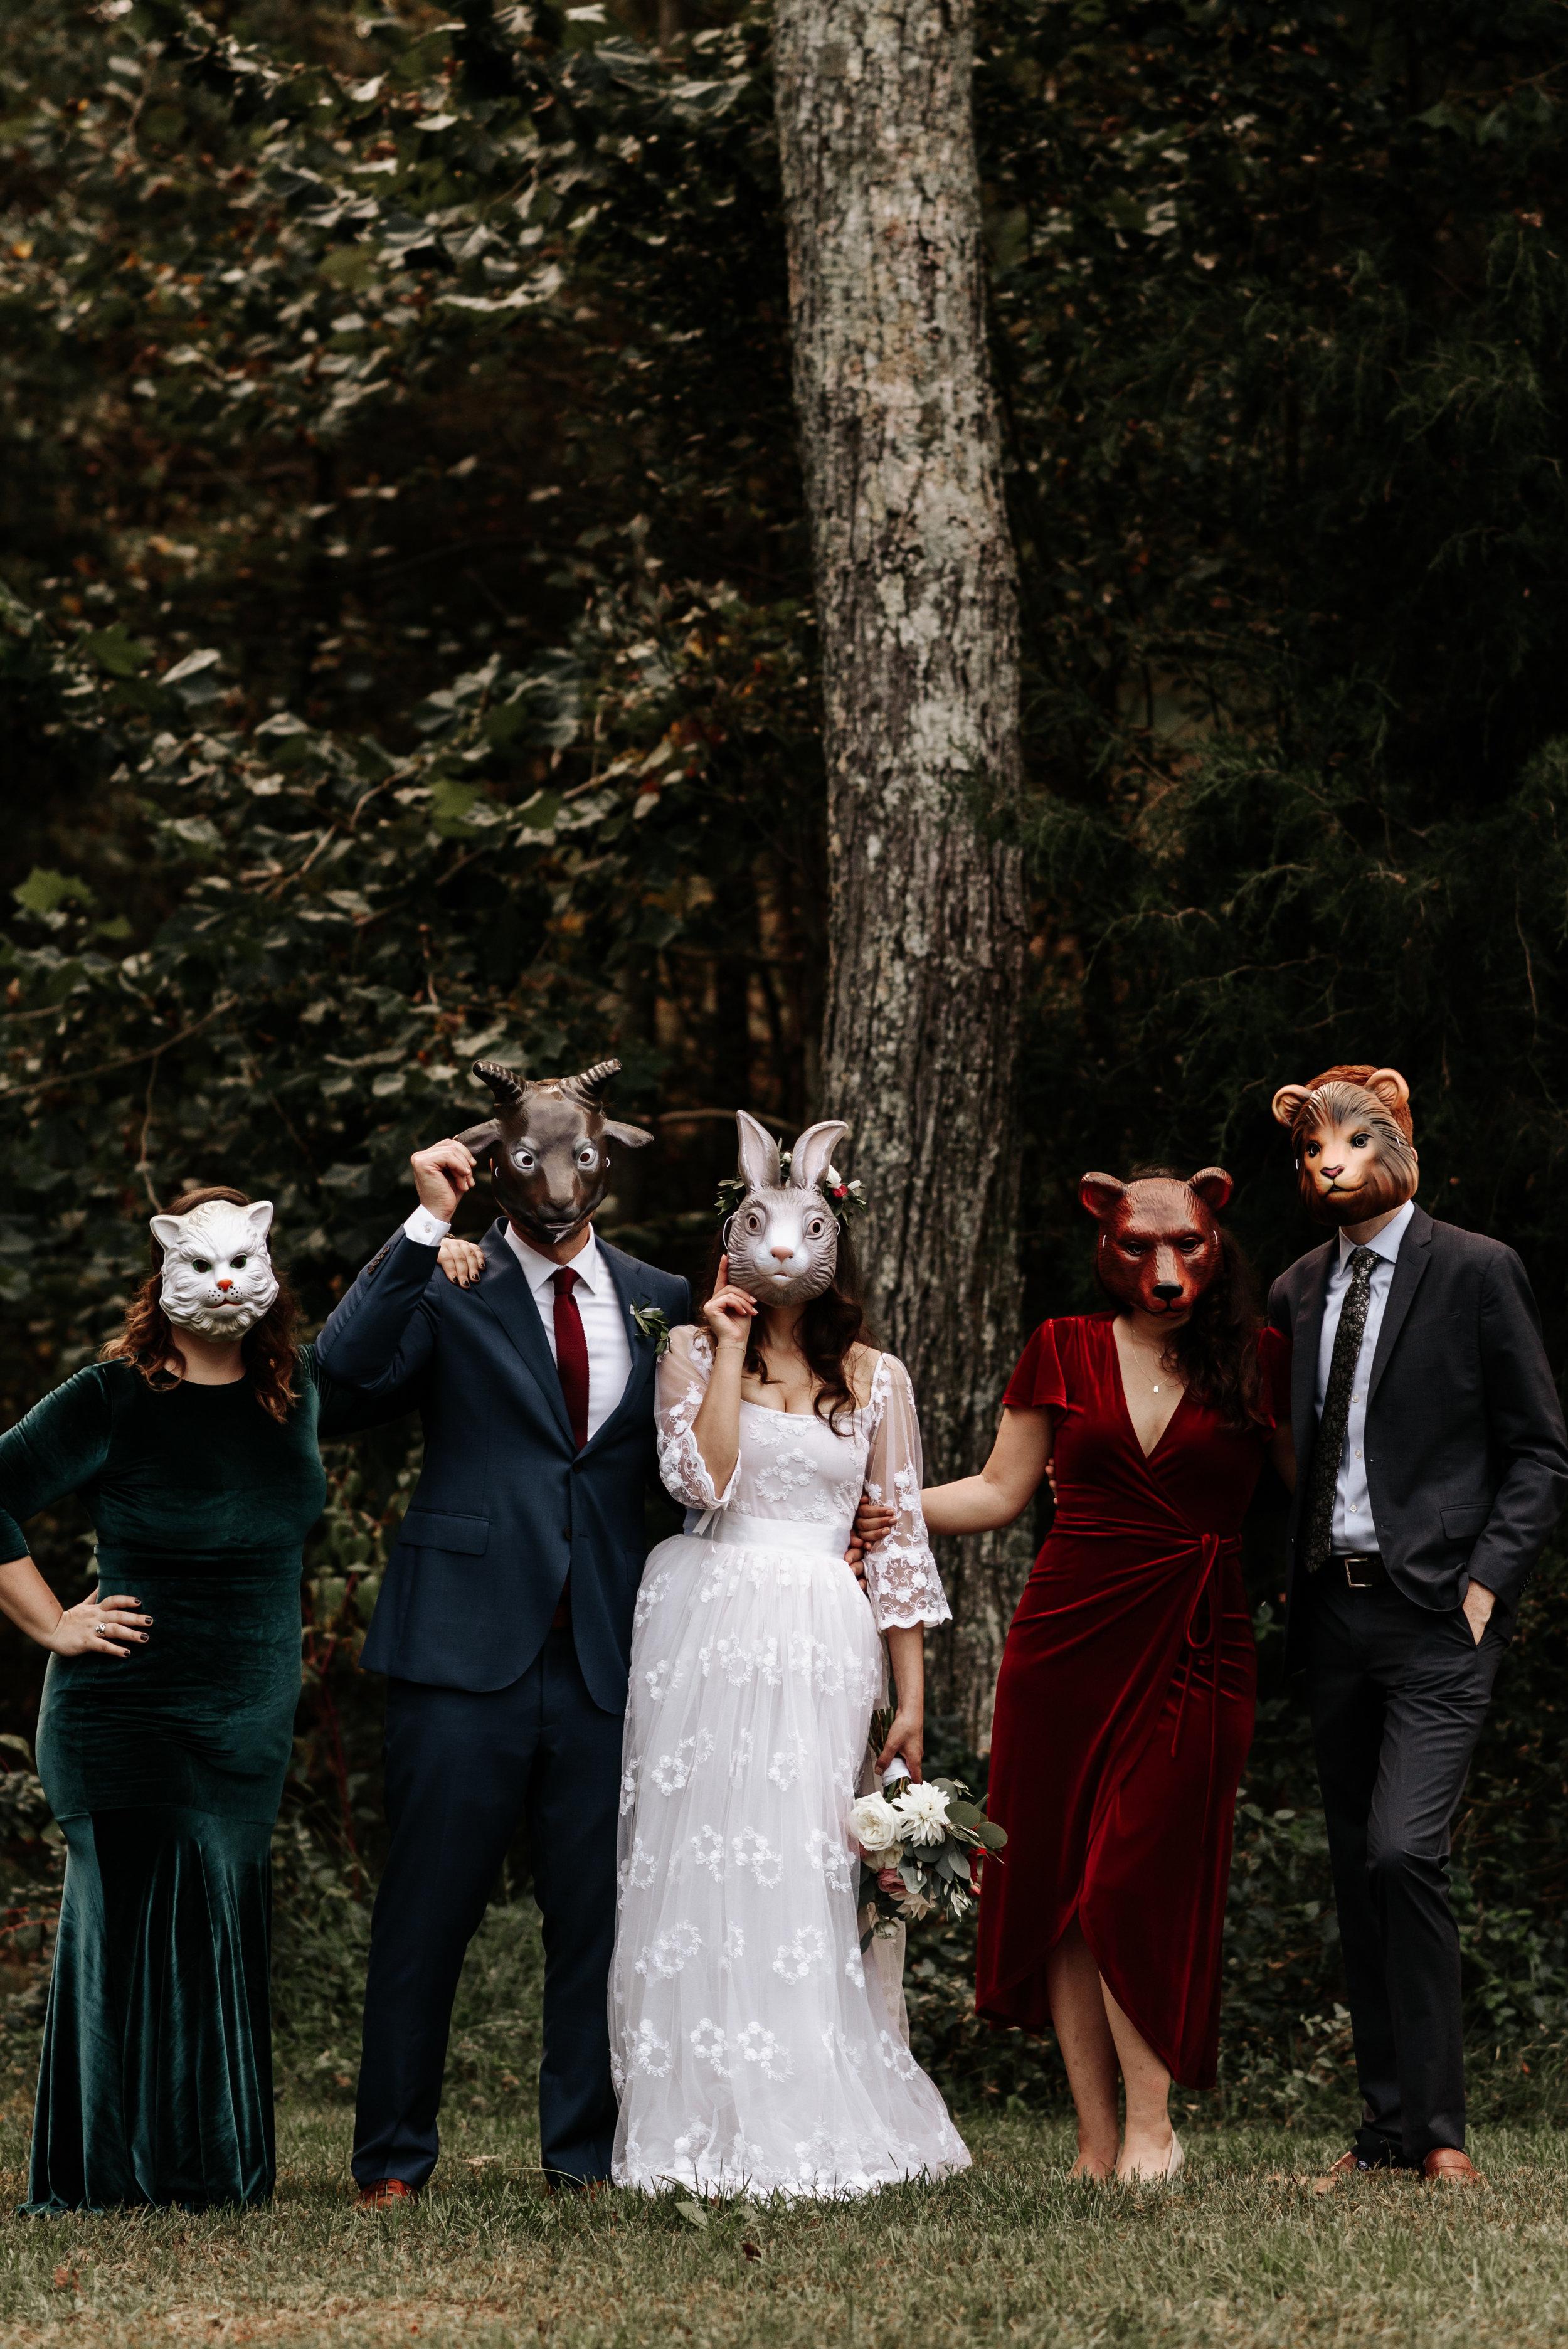 Veritas-Vineyards-and-Winery-Wedding-Photography-Afton-Virginia-Yasmin-Seth-Photography-by-V-2547.jpg